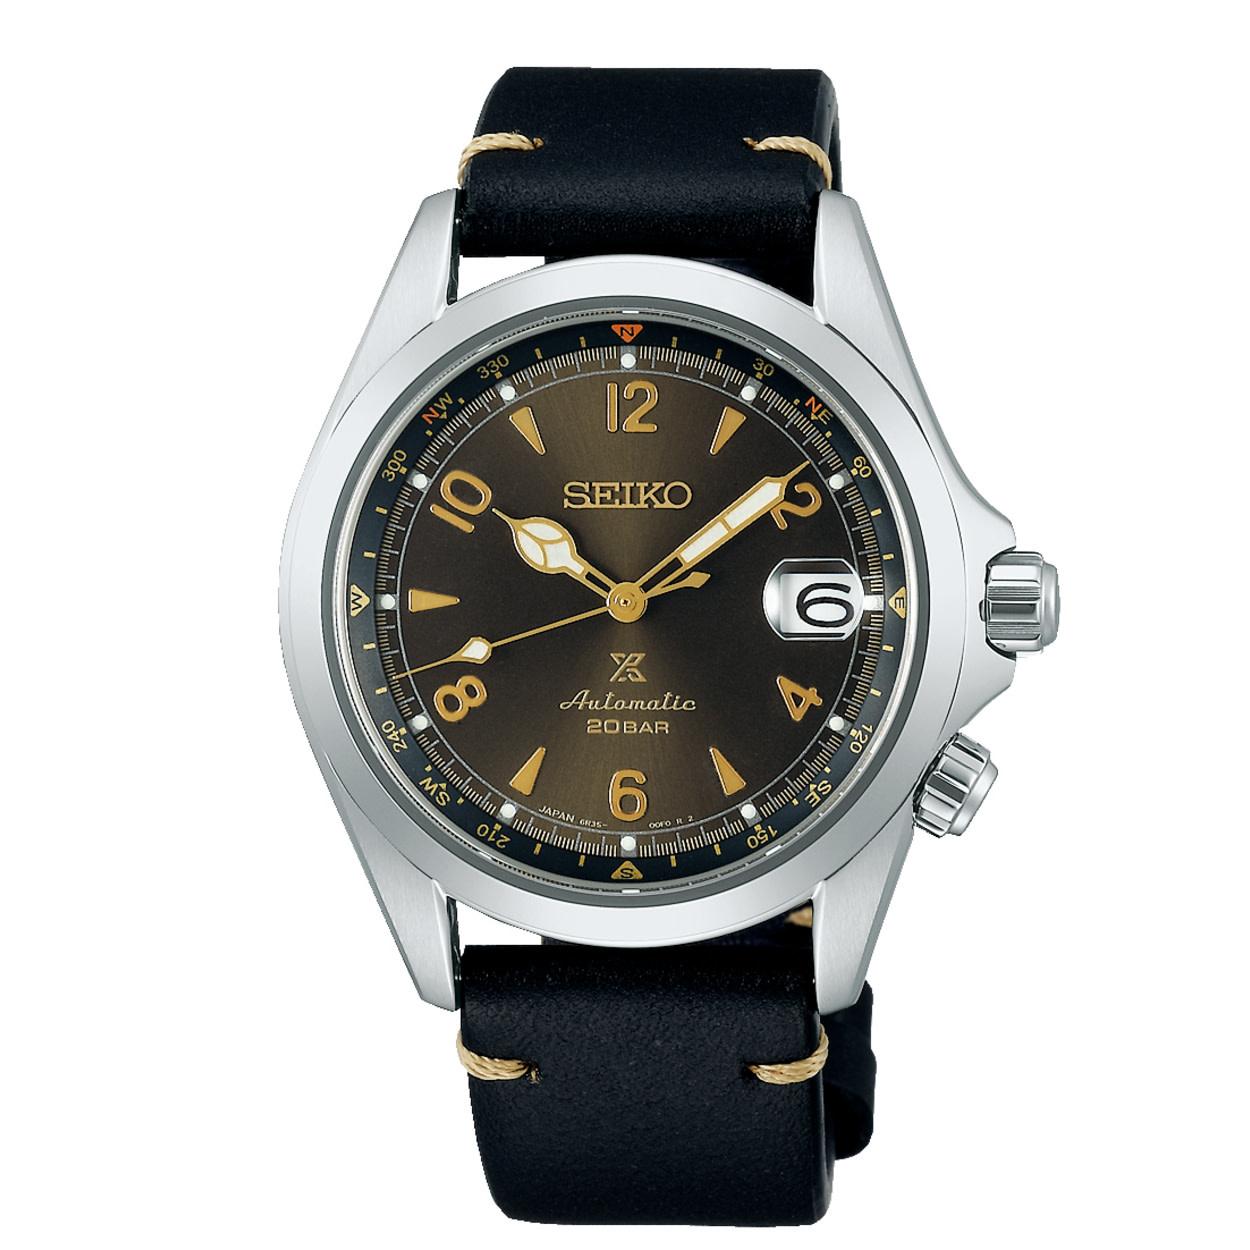 Seiko Seiko horloge Prospex SPB209J1